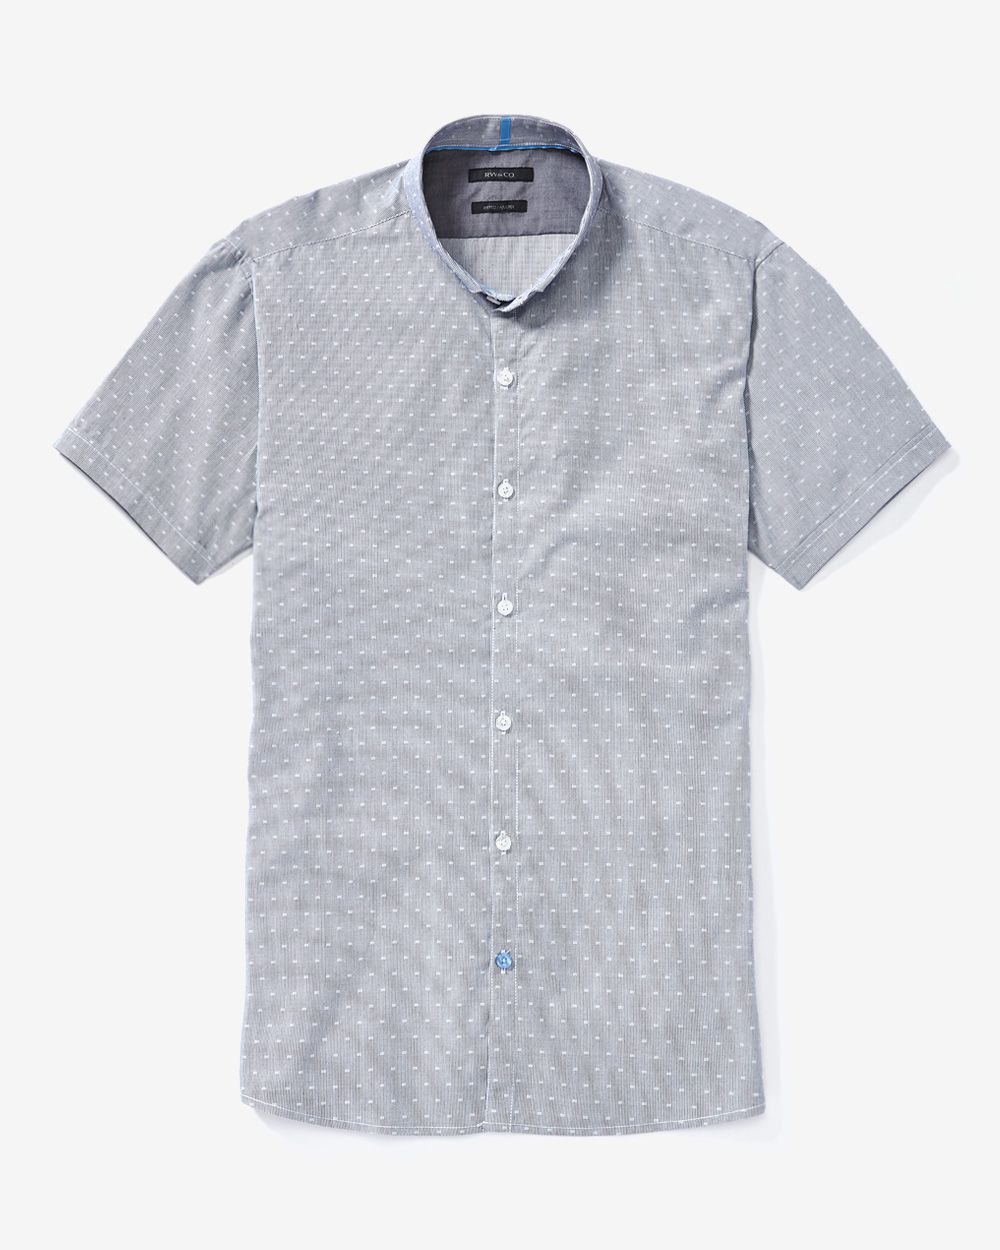 RW&CO.   Short sleeve jacquard shirt   Summer 2015